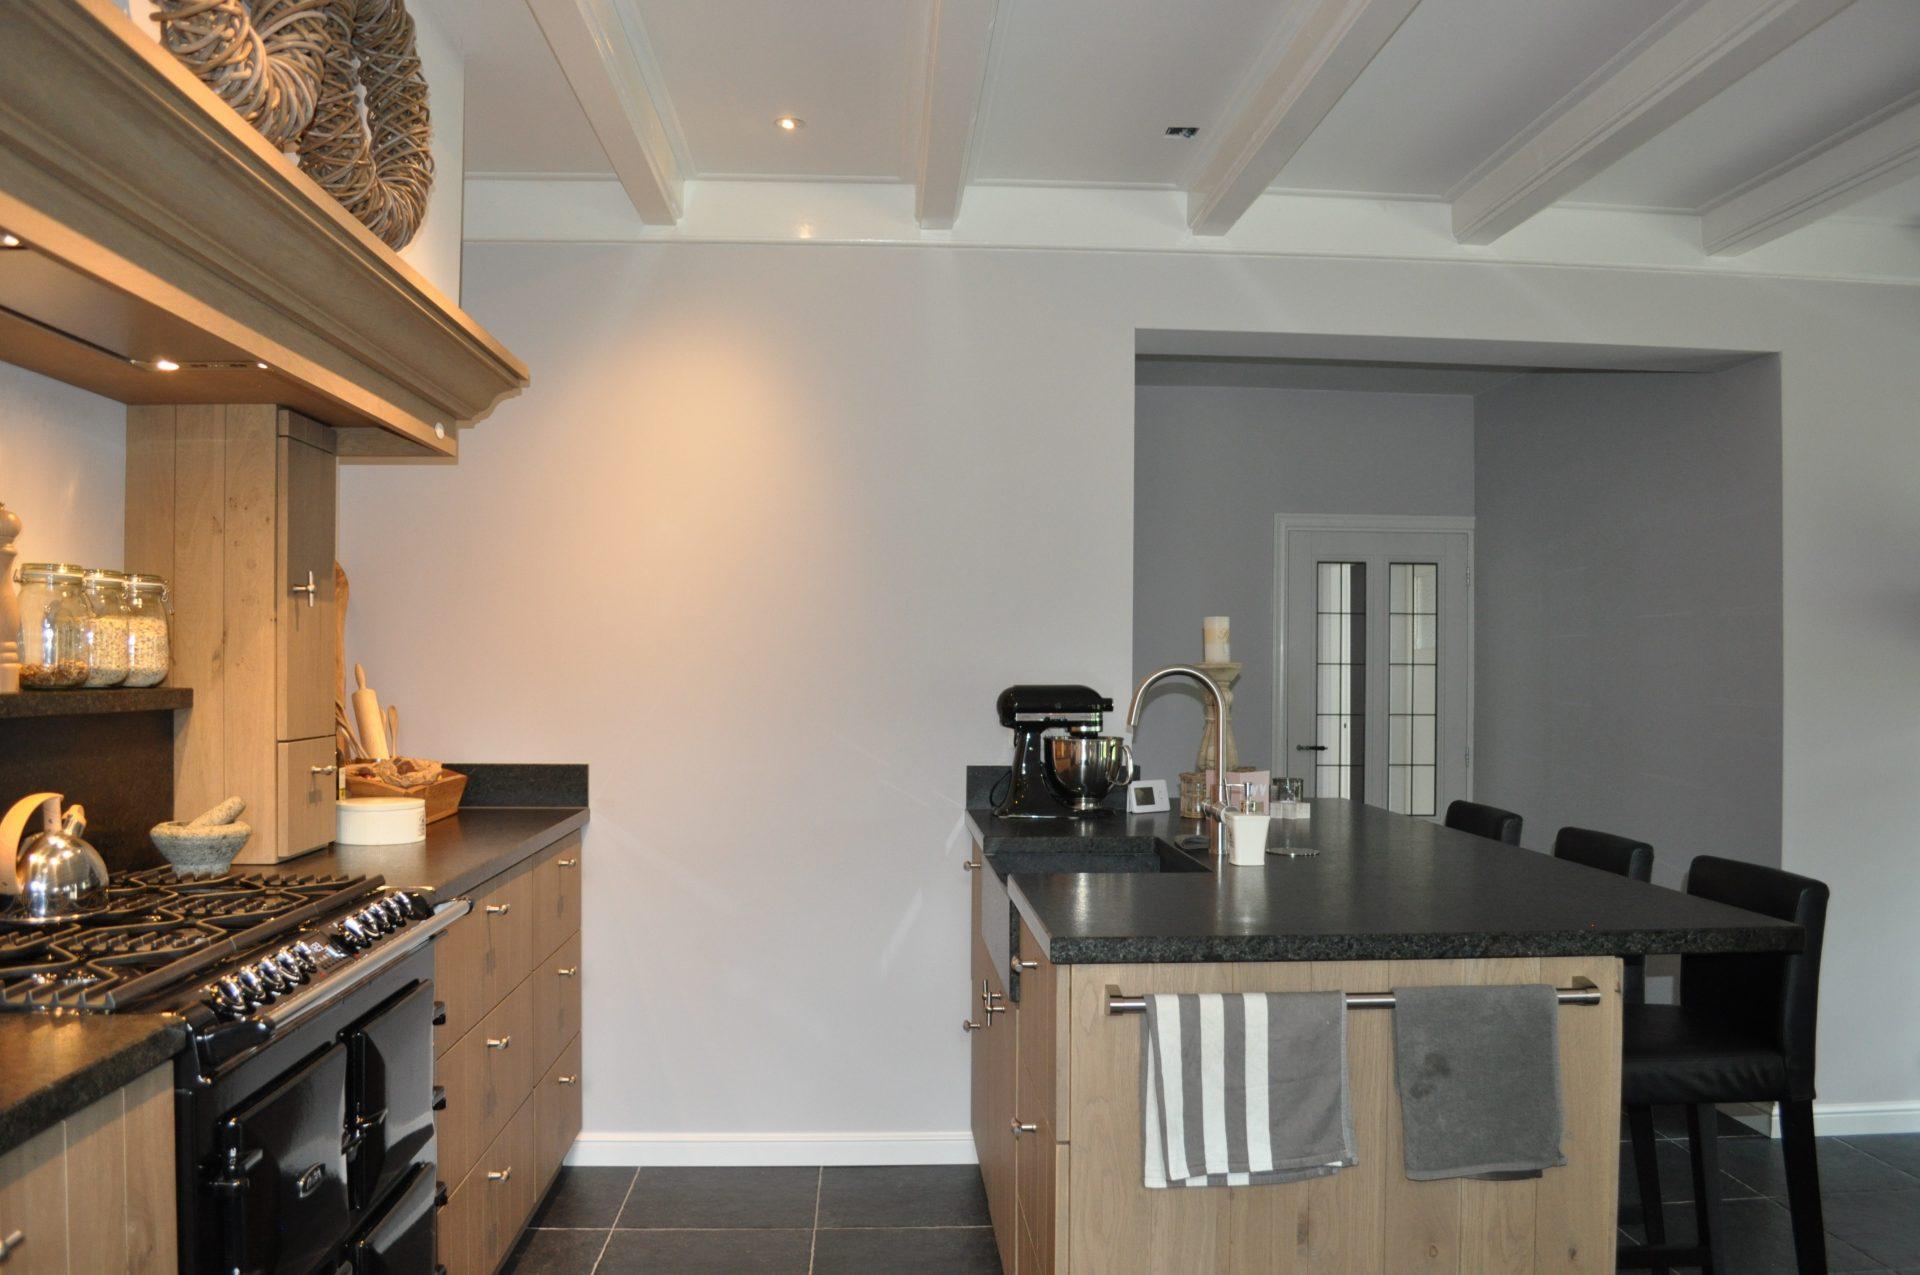 Stoere Keuken Grey : Landelijke keukens eco keukens